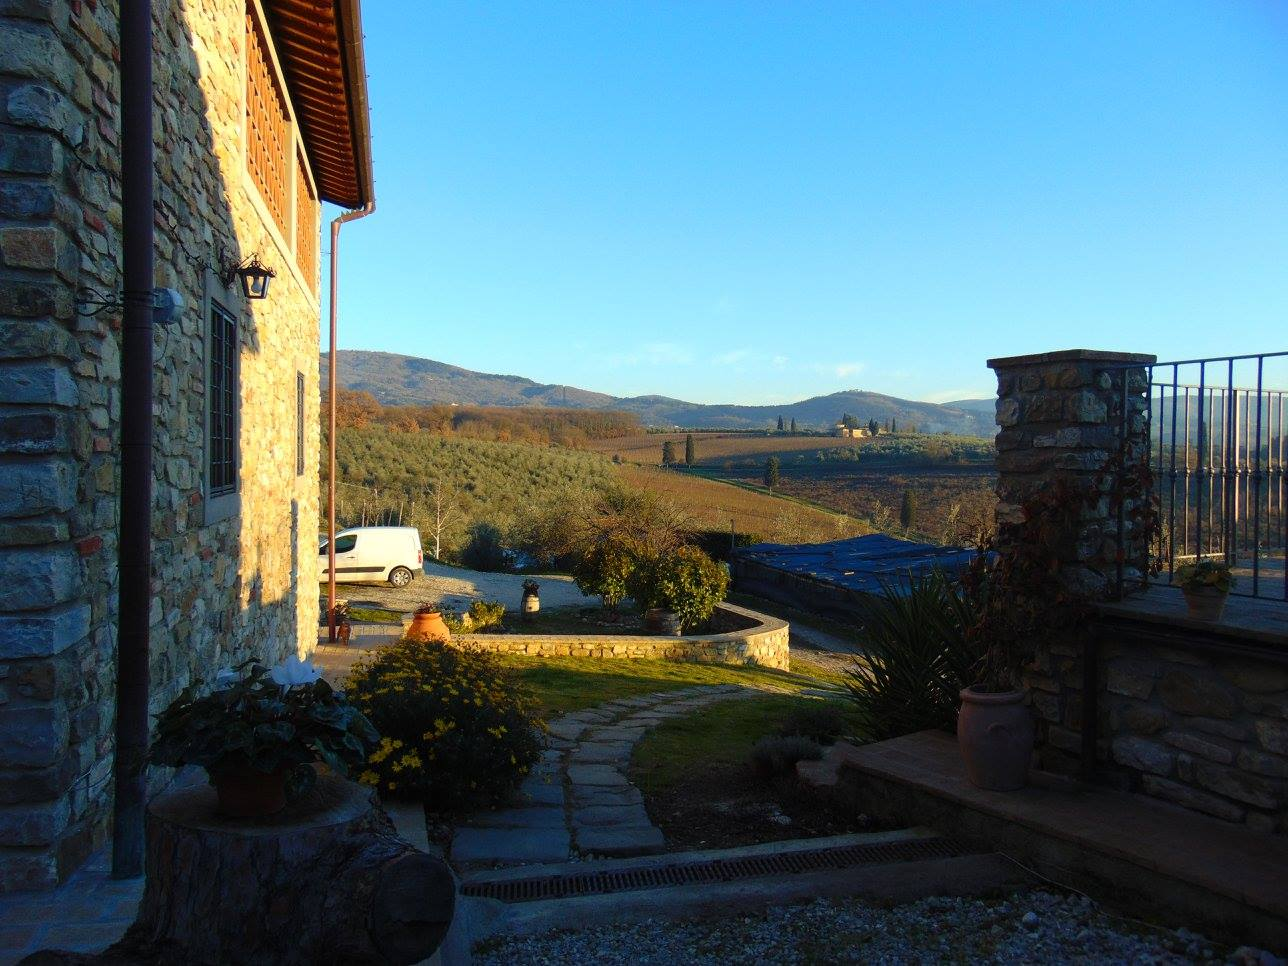 https://www.agriturismocircugnano.it/immagini_pagine/18-02-2018/1518969100-380-.jpg